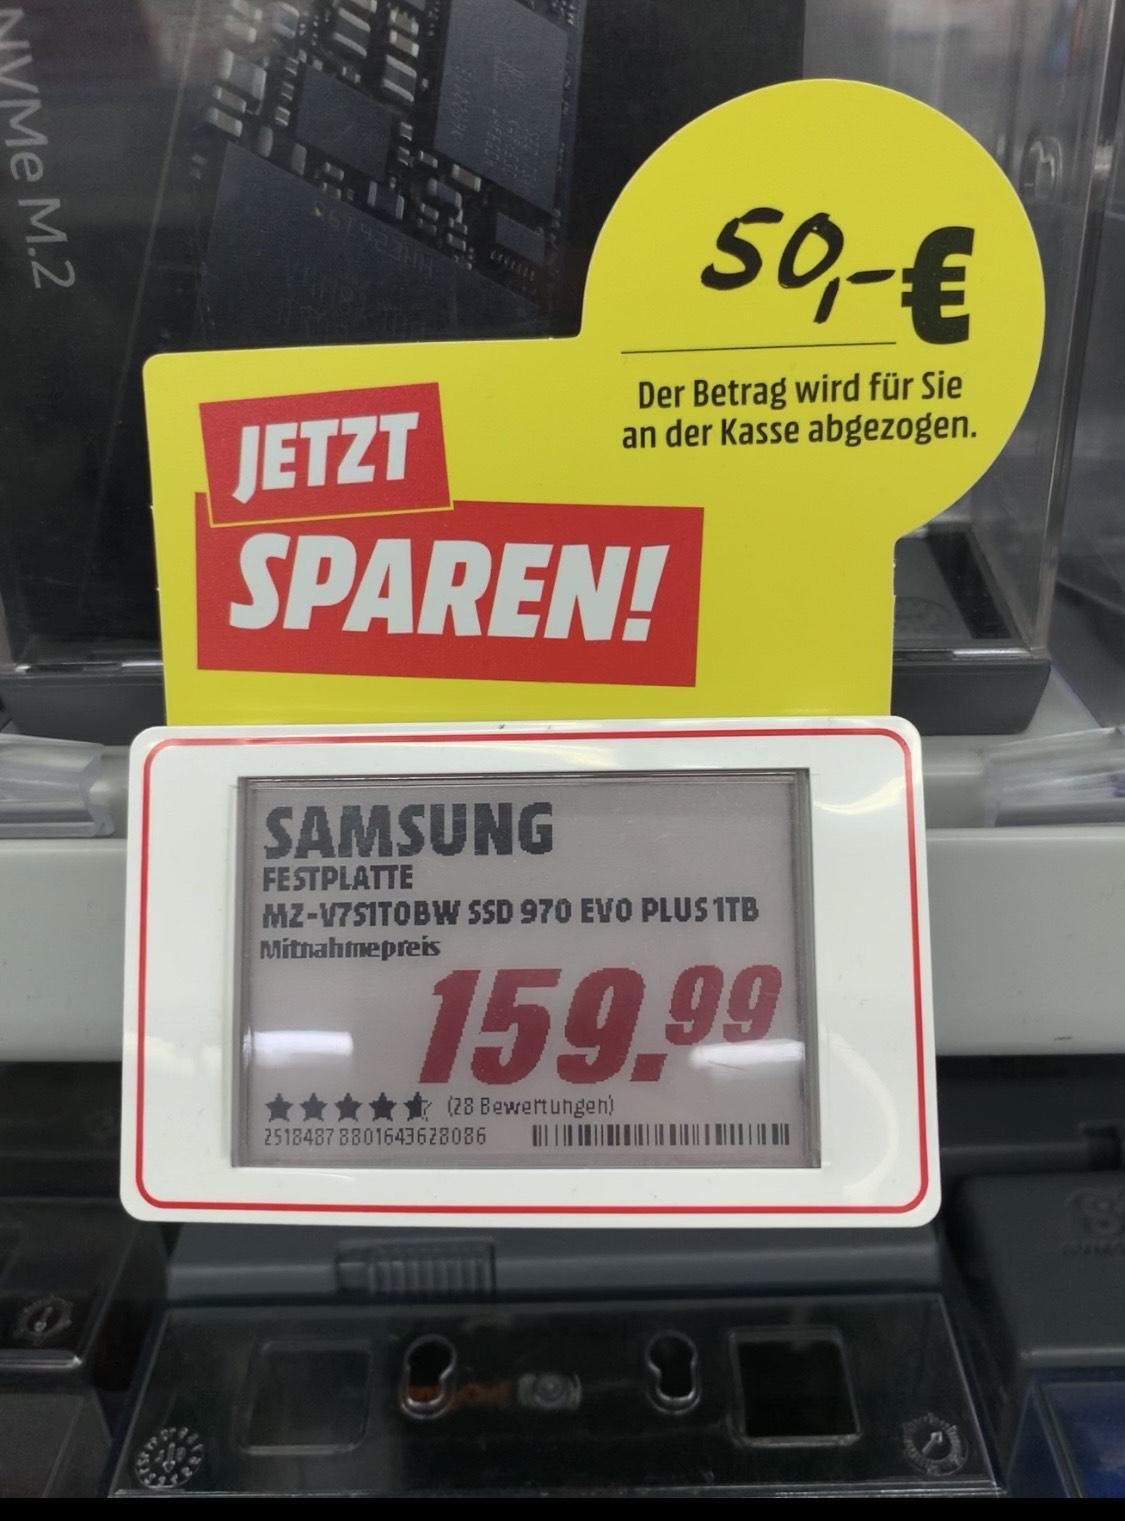 Samsung 970 EVO Plus 1TB *Lokal MM Lippstadt*